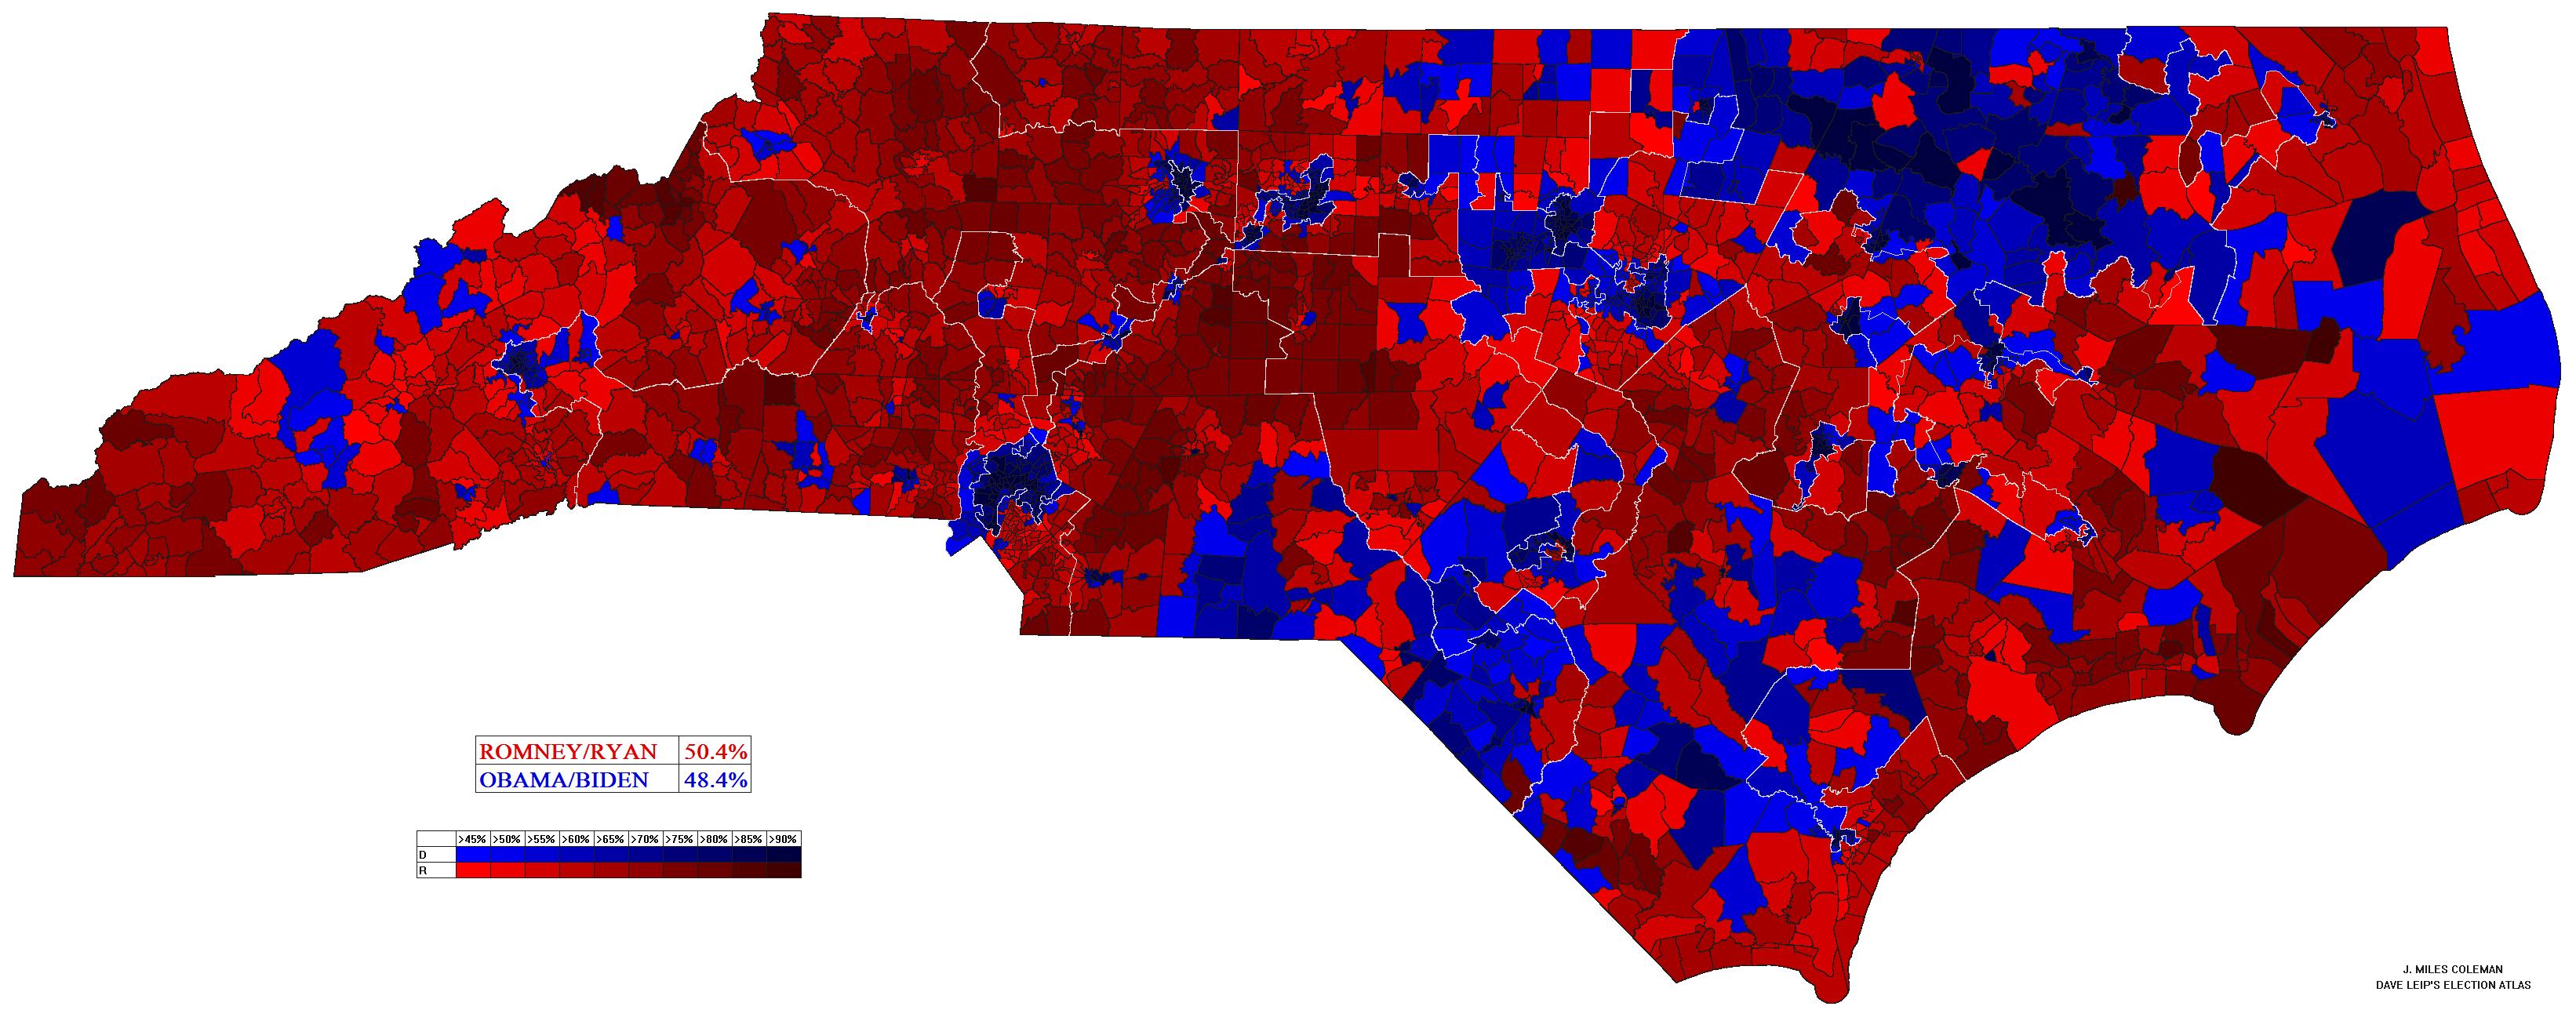 FileNorth Carolina 2012 Presidential Election By Voting